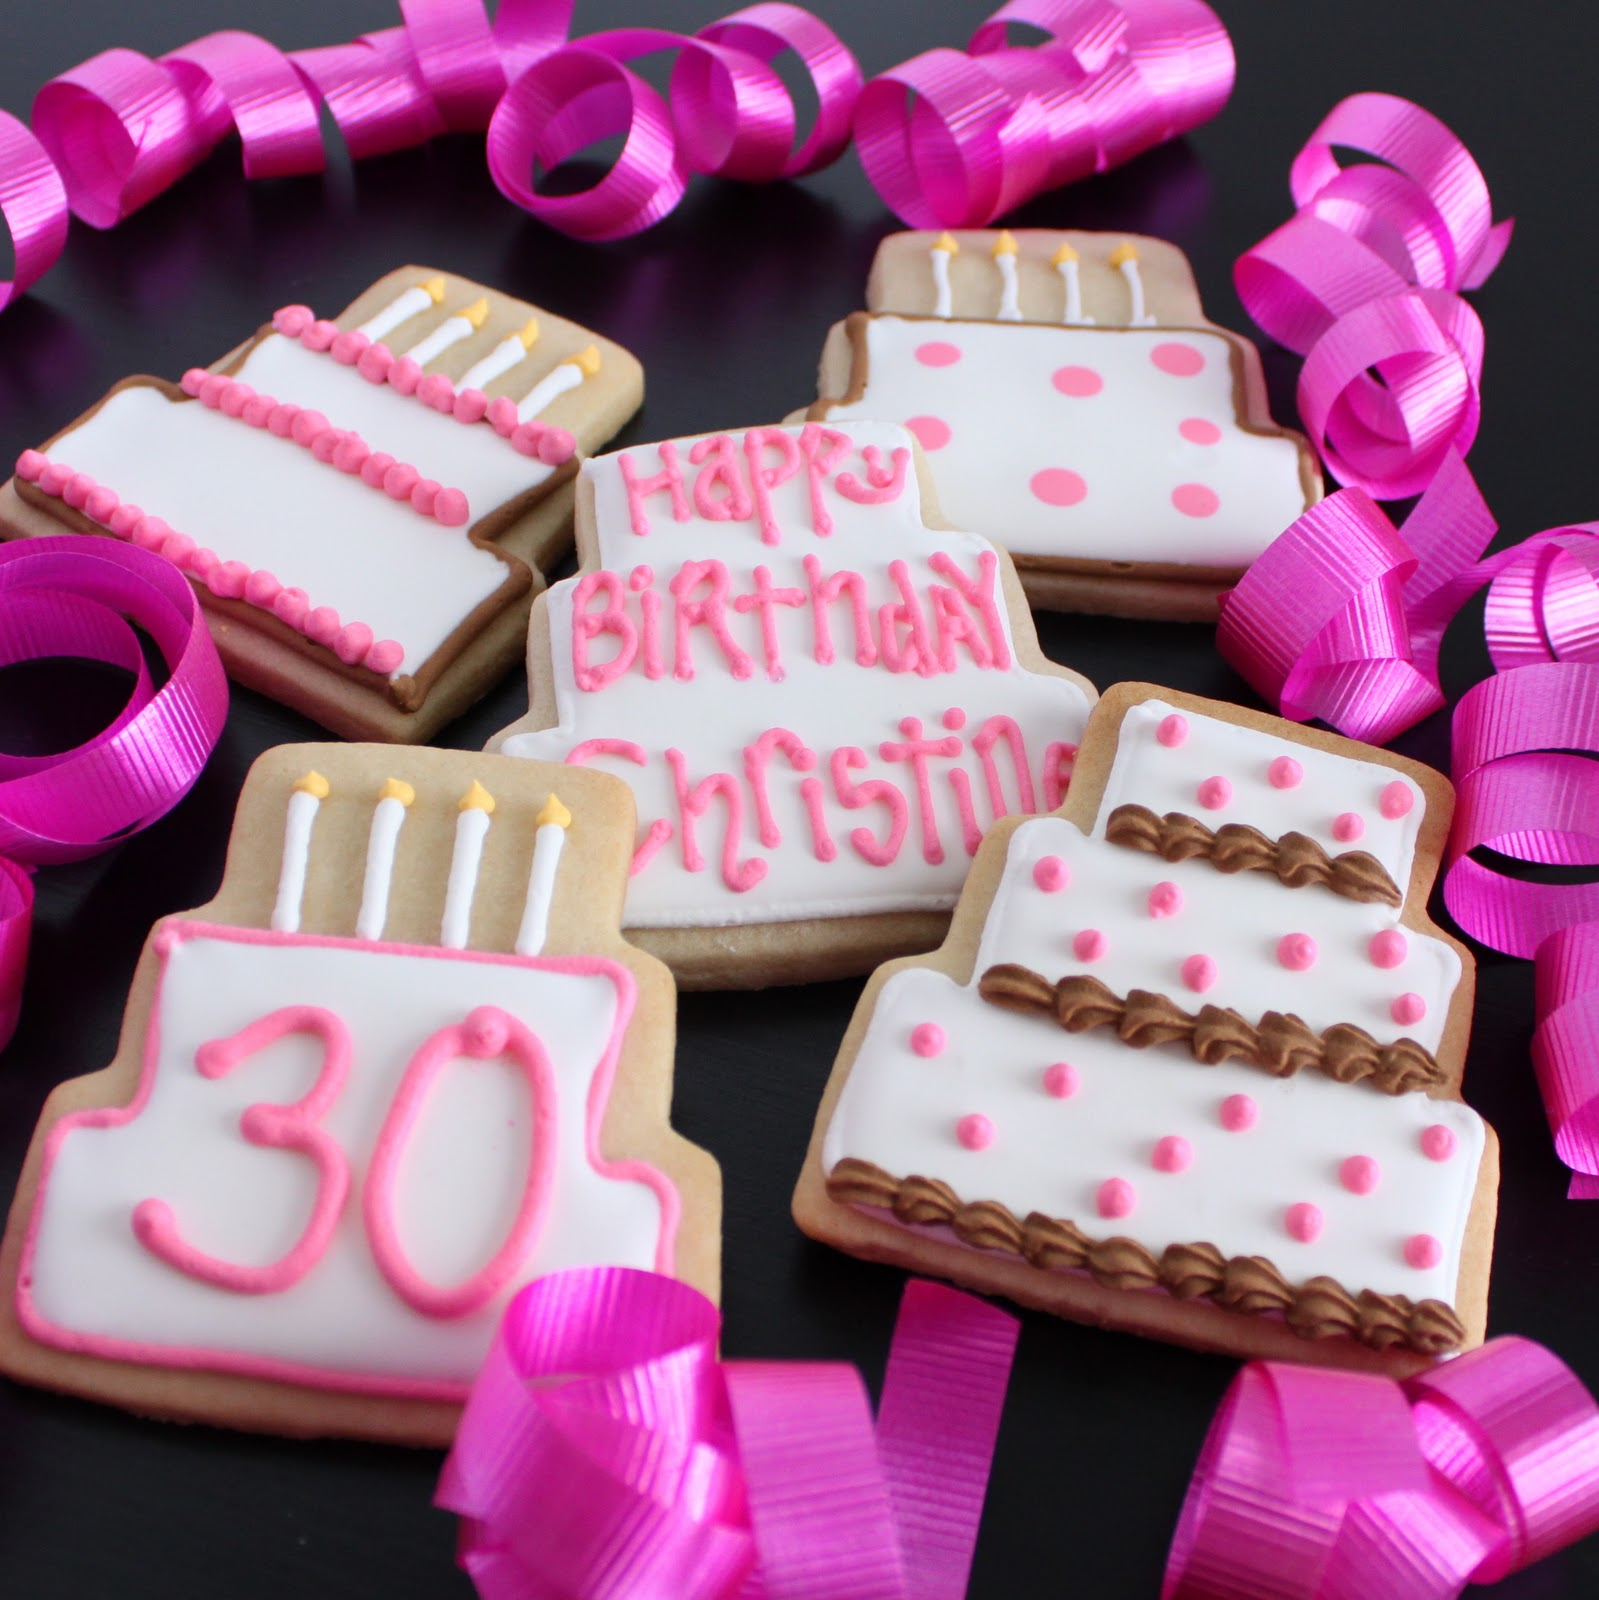 Birthday Cake And Royal Icing Sugar Cookies